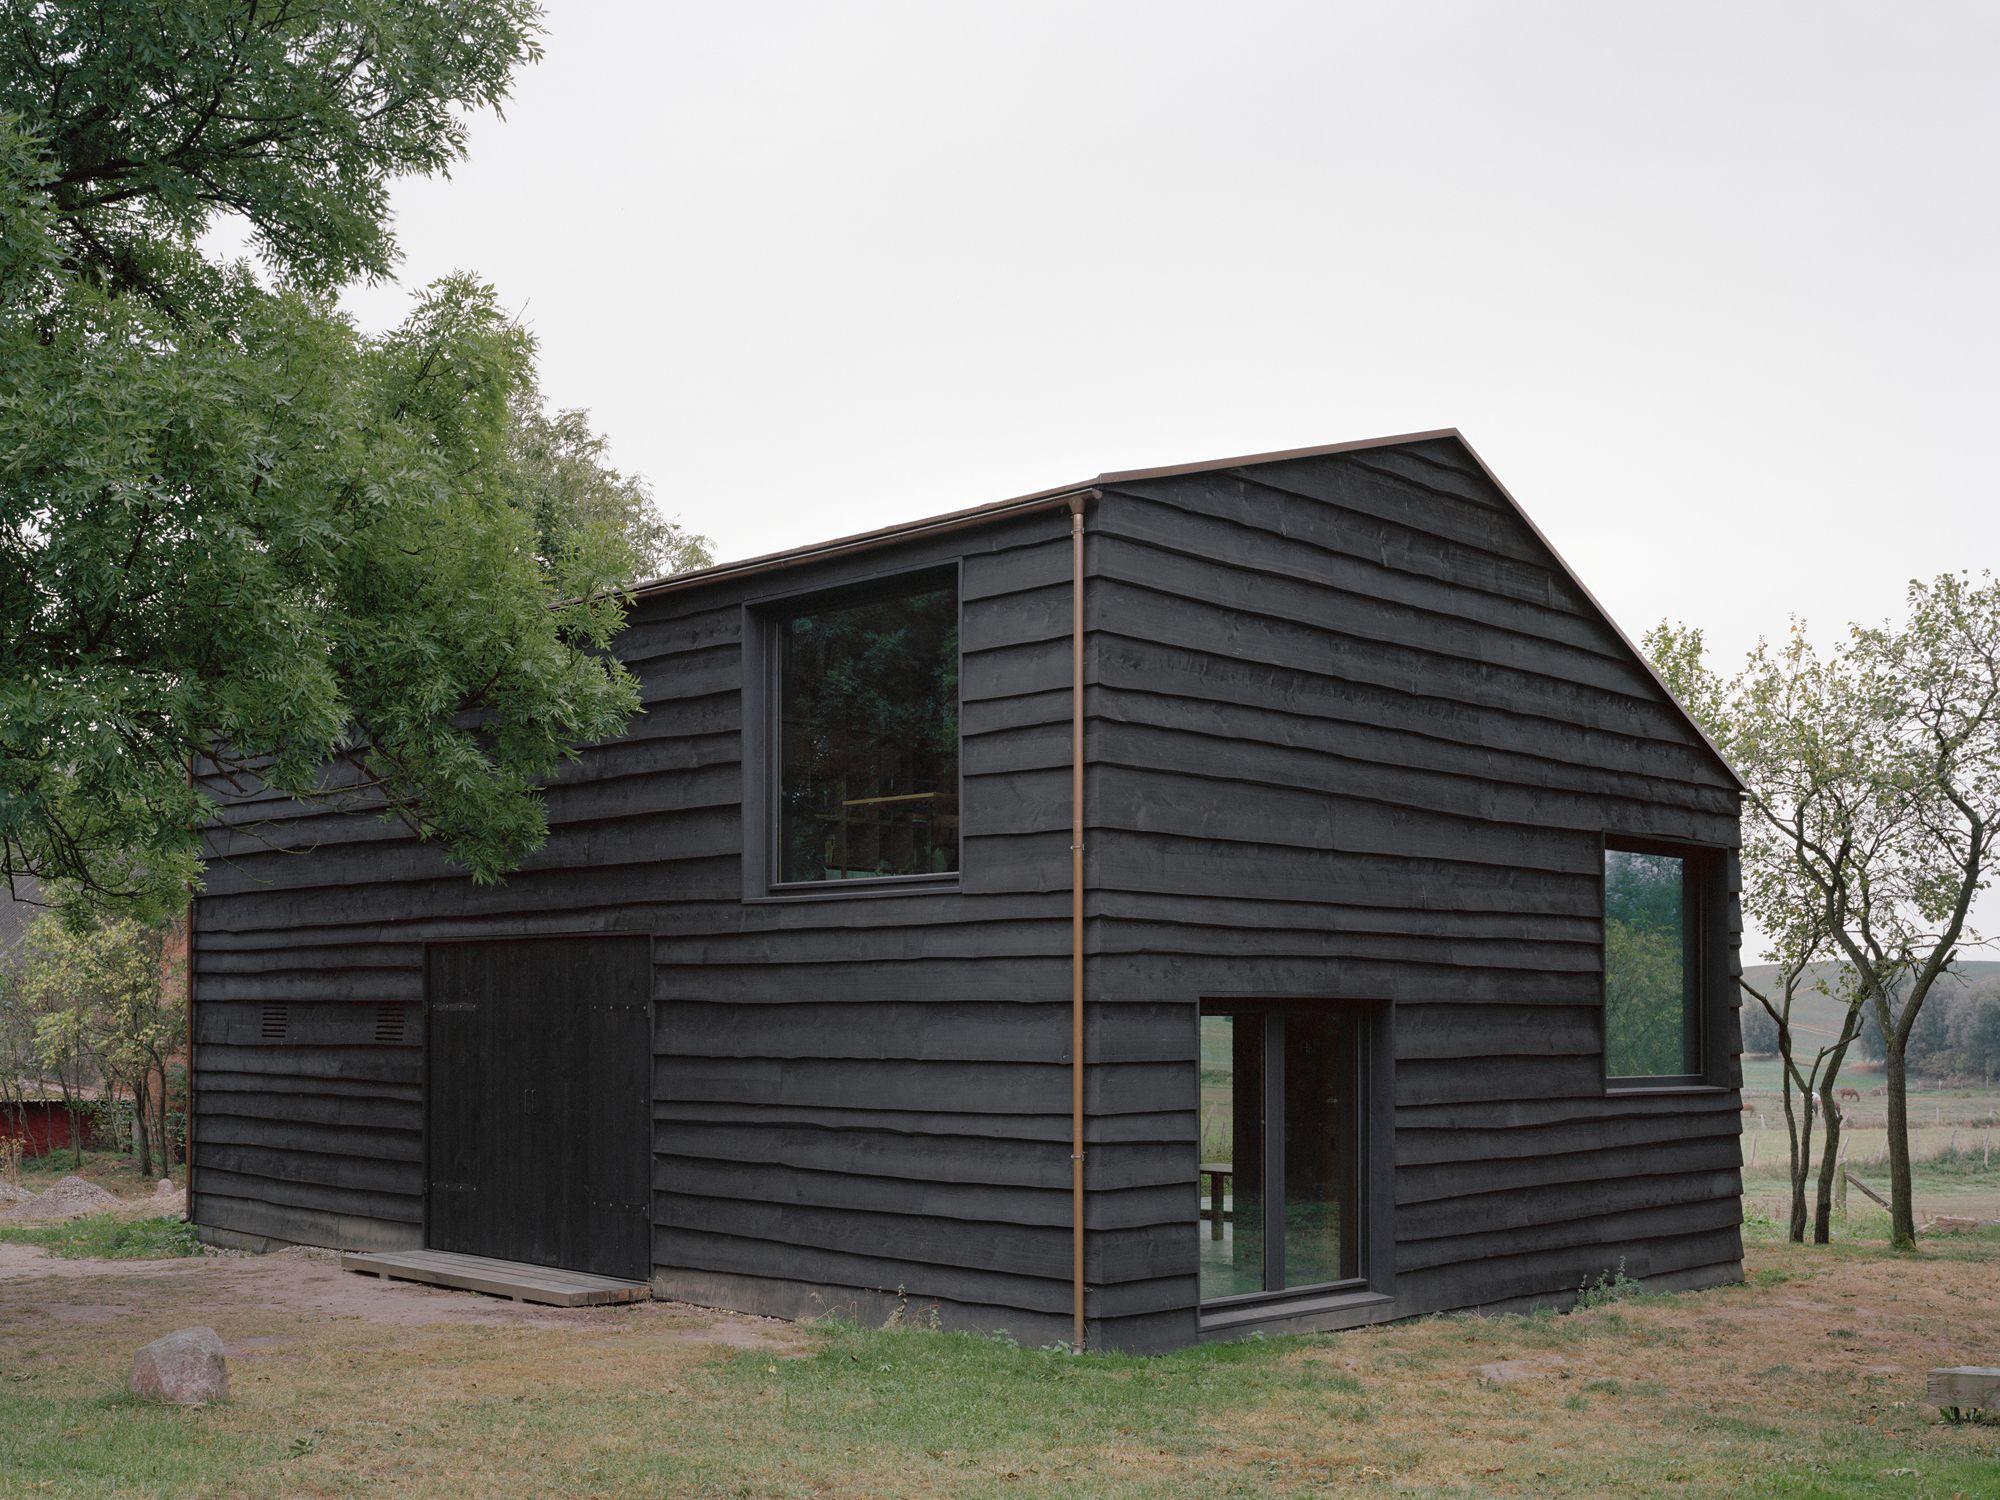 Haus Lindetal in MecklenburgVorpommern Fassade haus